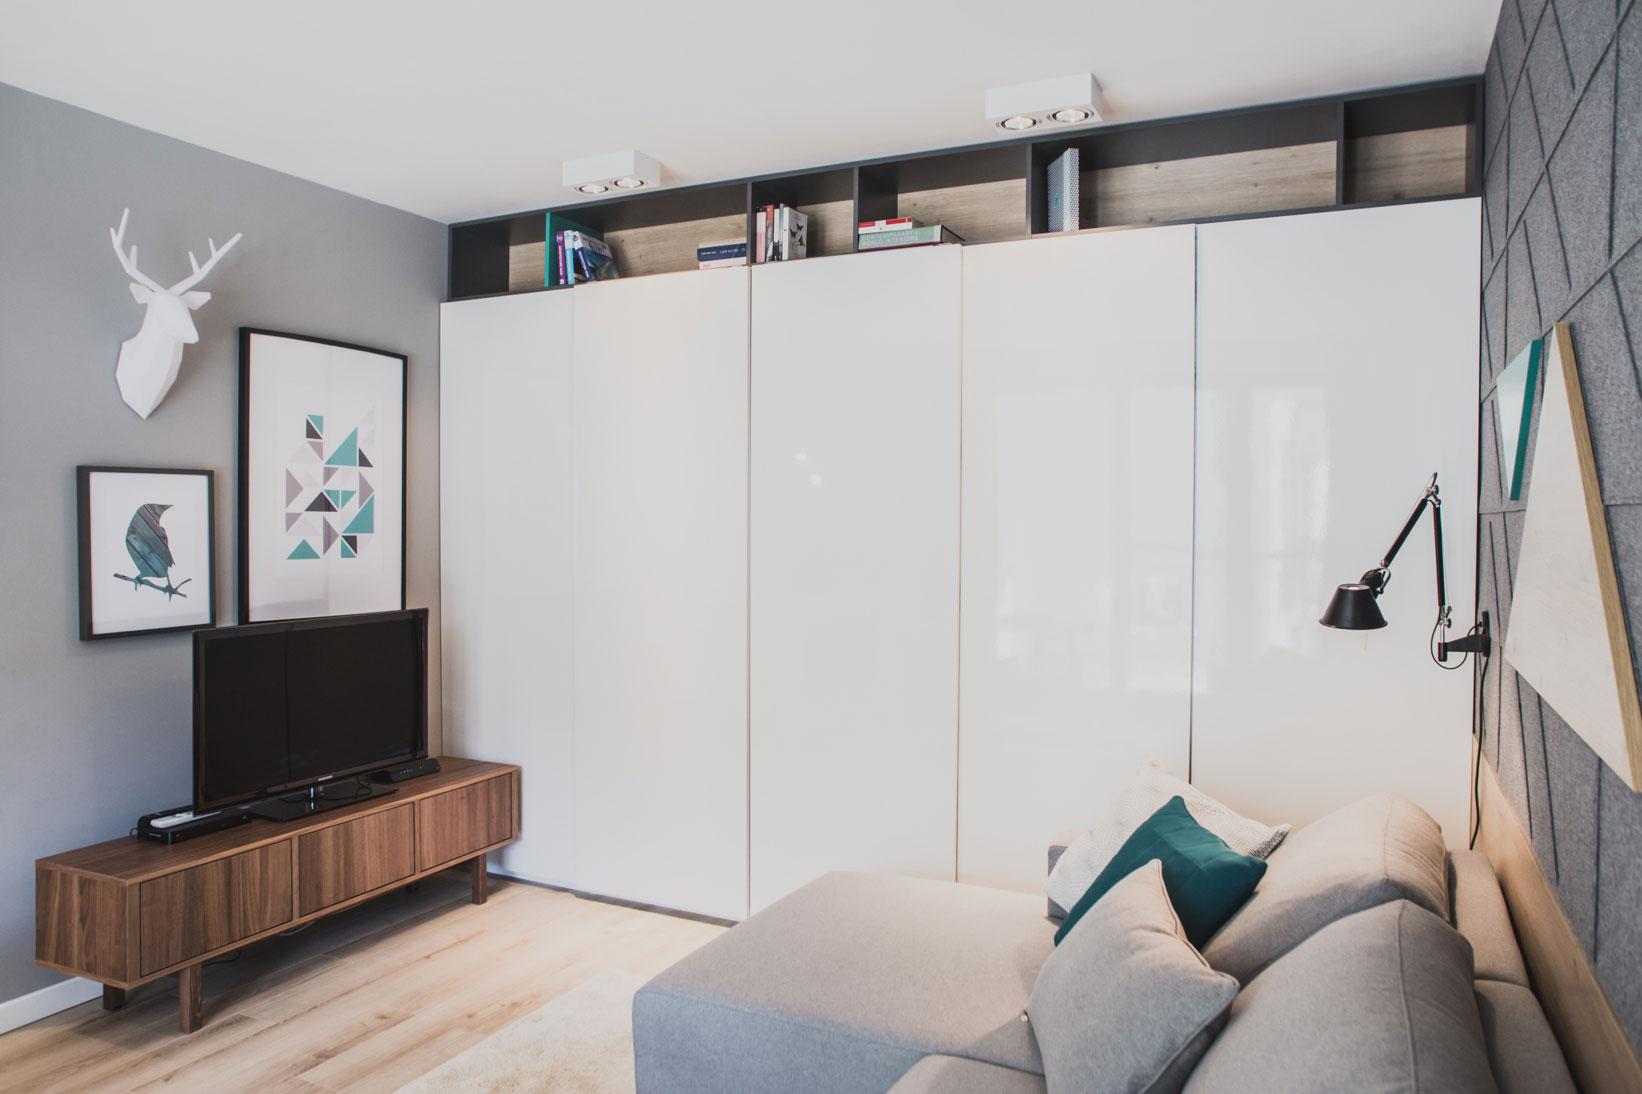 Szafarnia 2 Compact Apartment by Raca Architekci-12